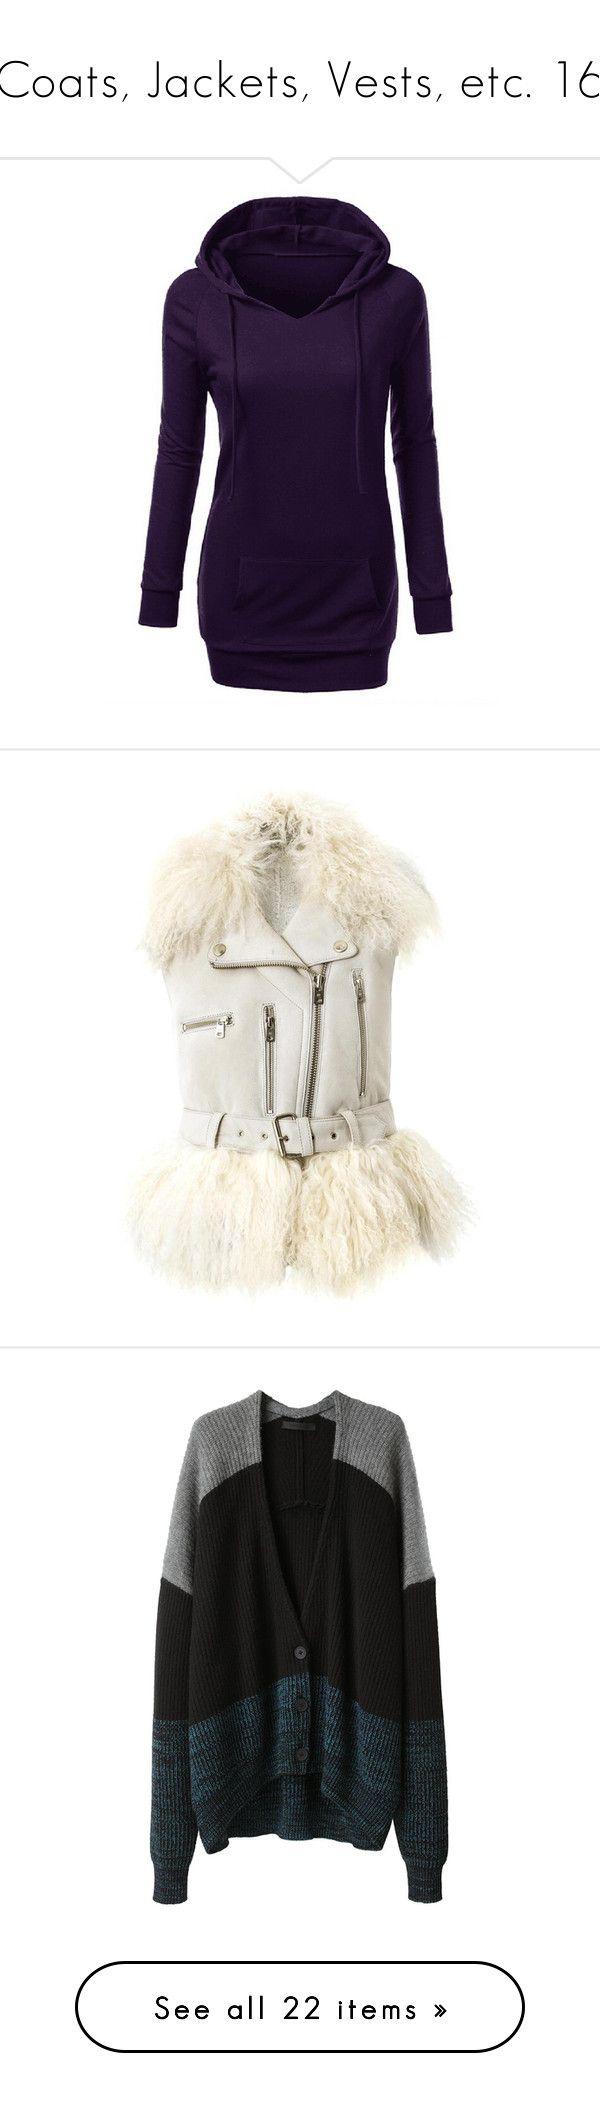 """Coats, Jackets, Vests, etc. 16"" by xx-black-blade-xx ❤ liked on Polyvore featuring tops, hoodies, purple hoodie, sweatshirt hoodies, long sleeve hooded sweatshirt, long tops, purple hoodies, outerwear, vests and jackets"